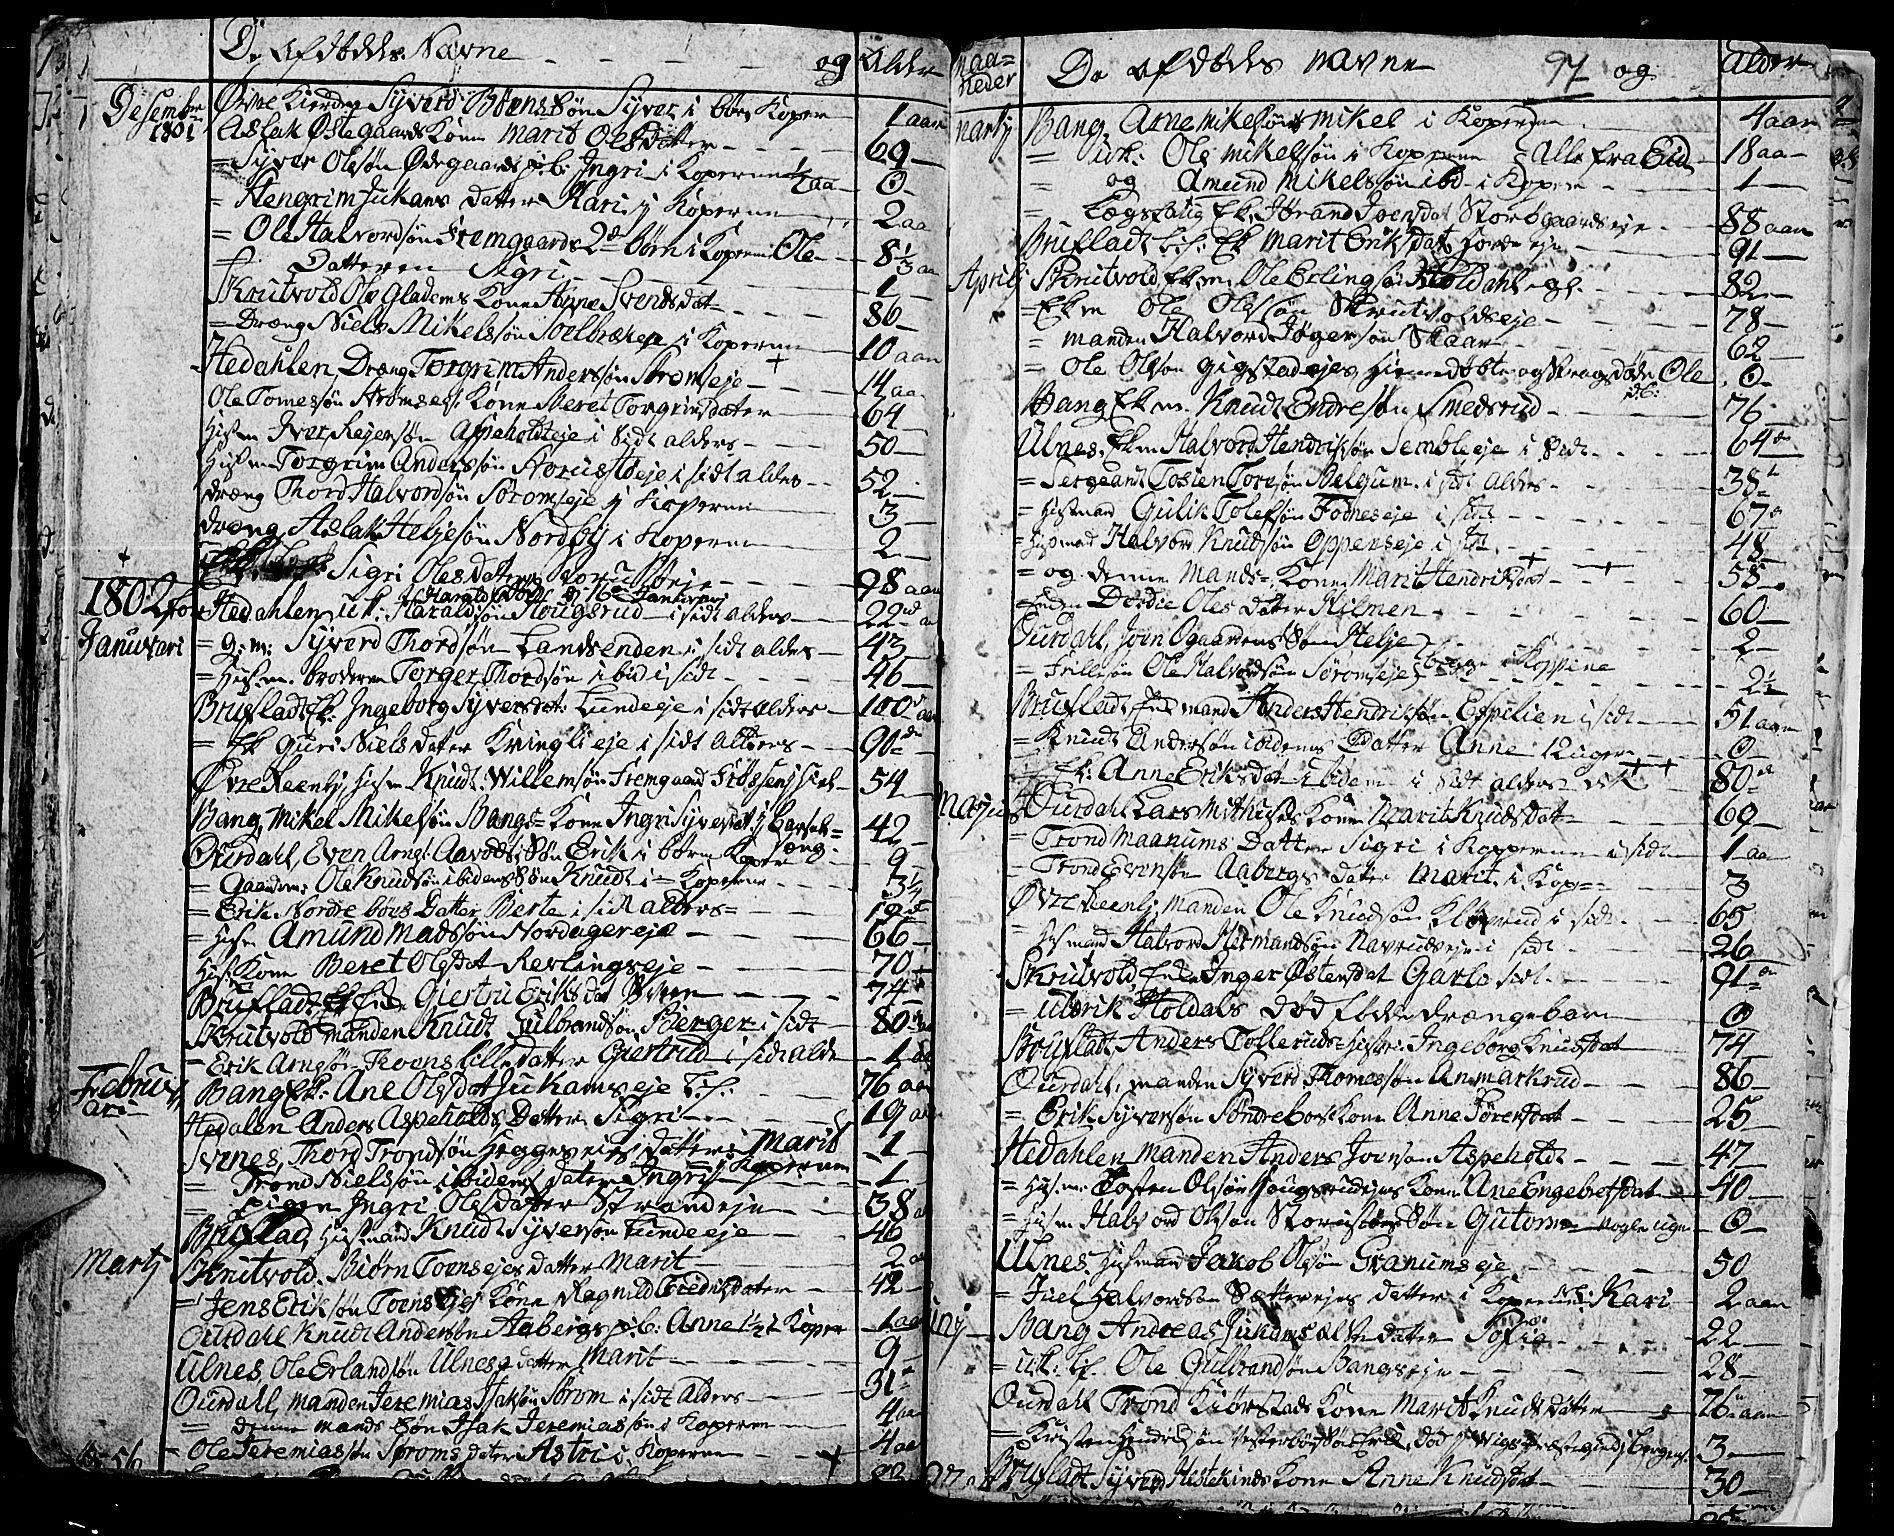 SAH, Aurdal prestekontor, Ministerialbok nr. 7, 1800-1808, s. 97